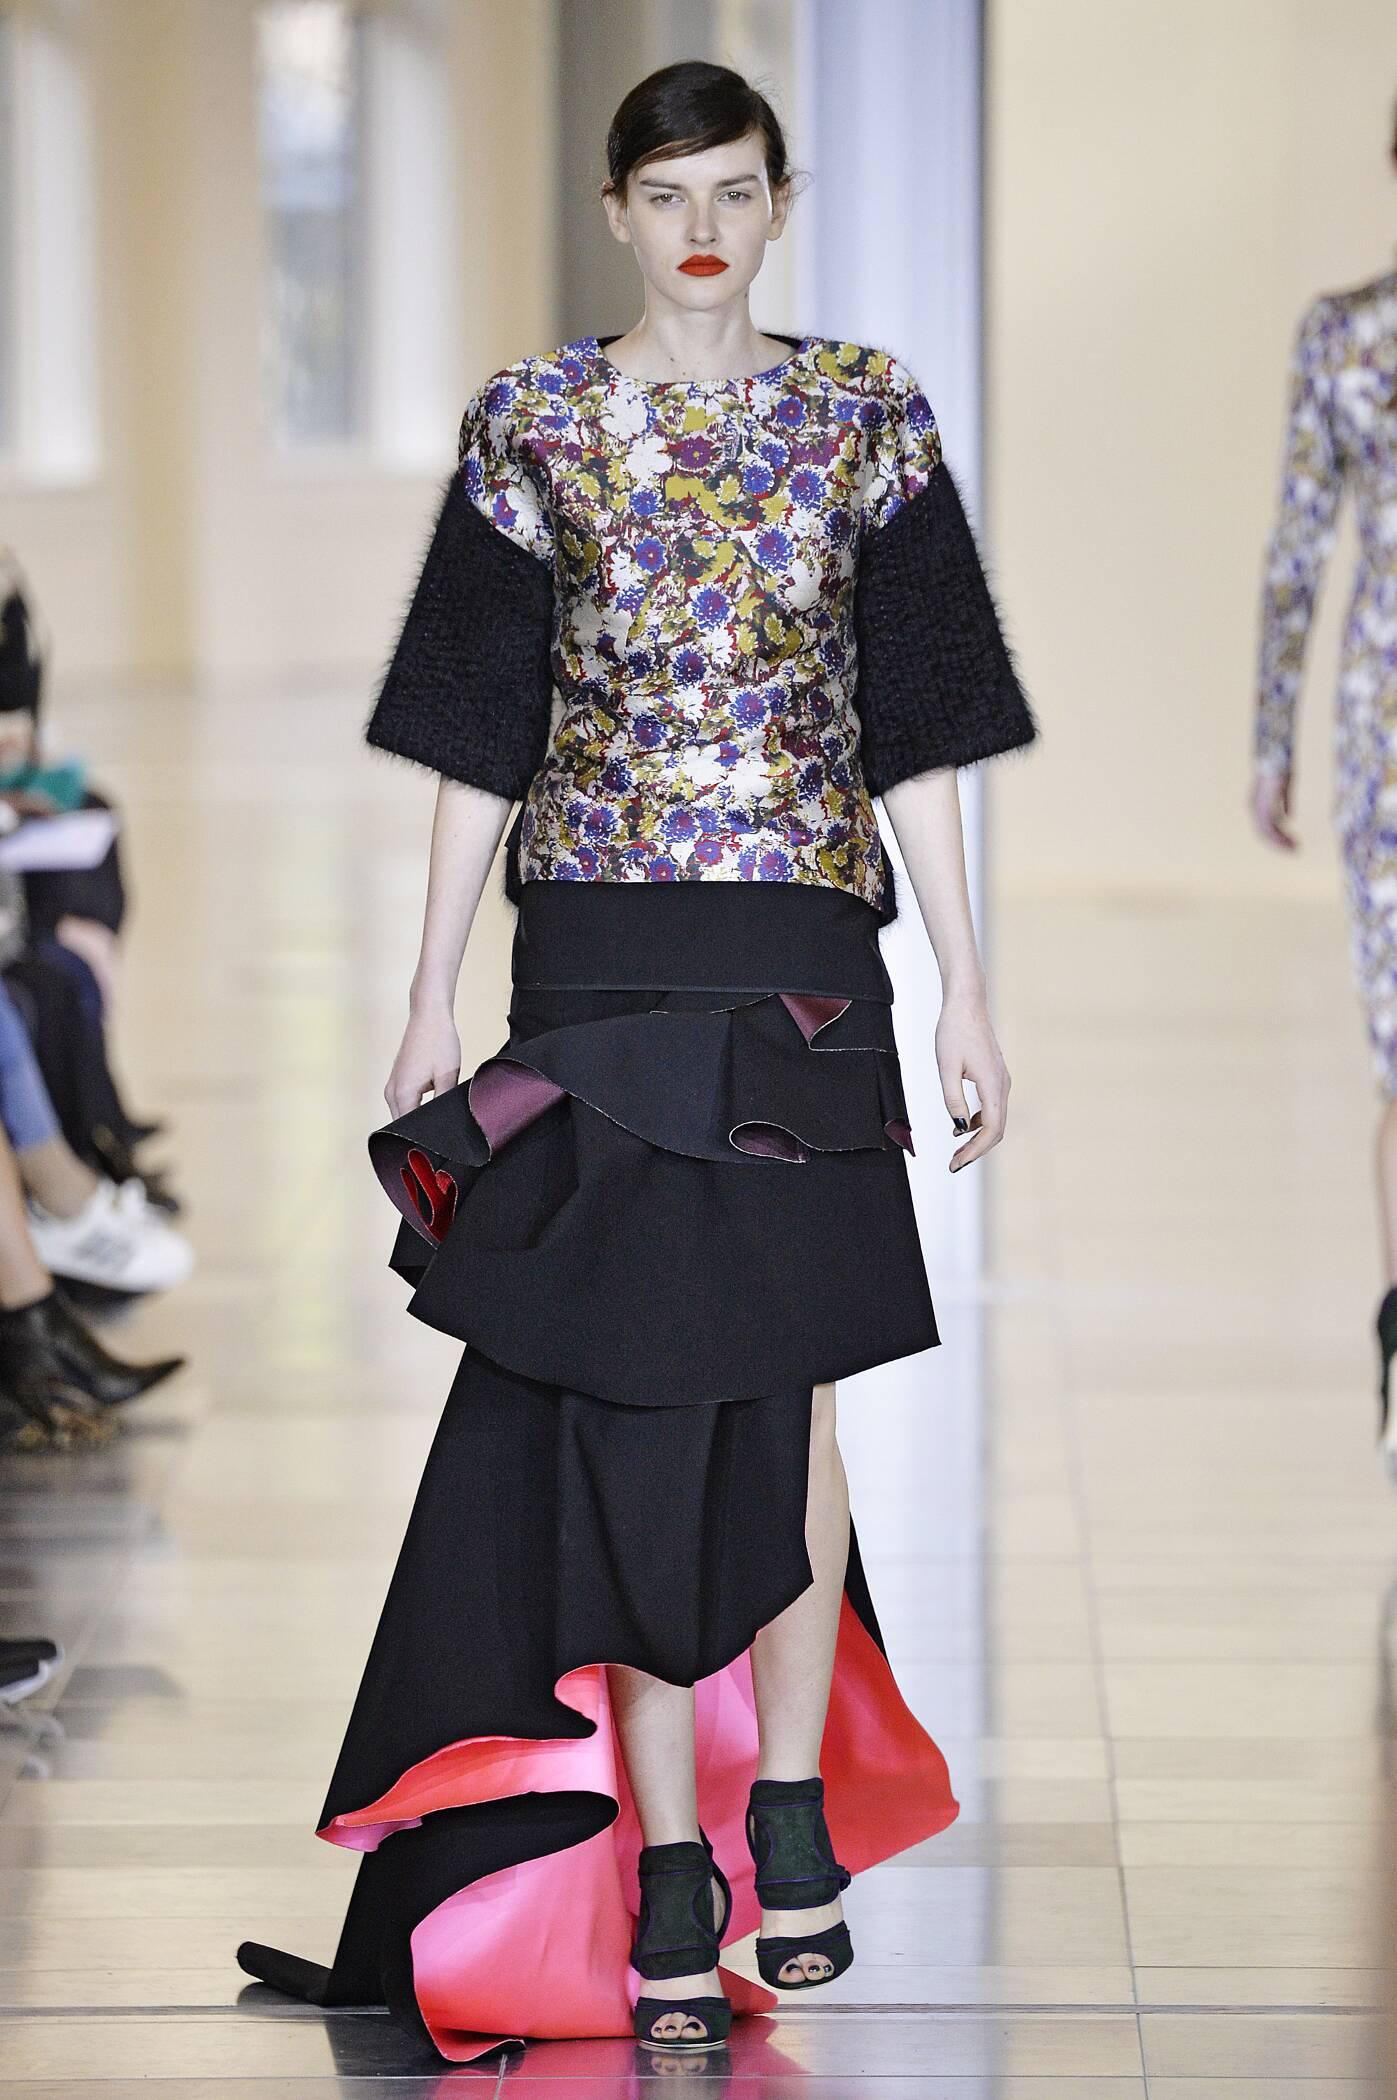 Catwalk Antonio Berardi Fall Winter 2015 16 Women's Collection London Fashion Week